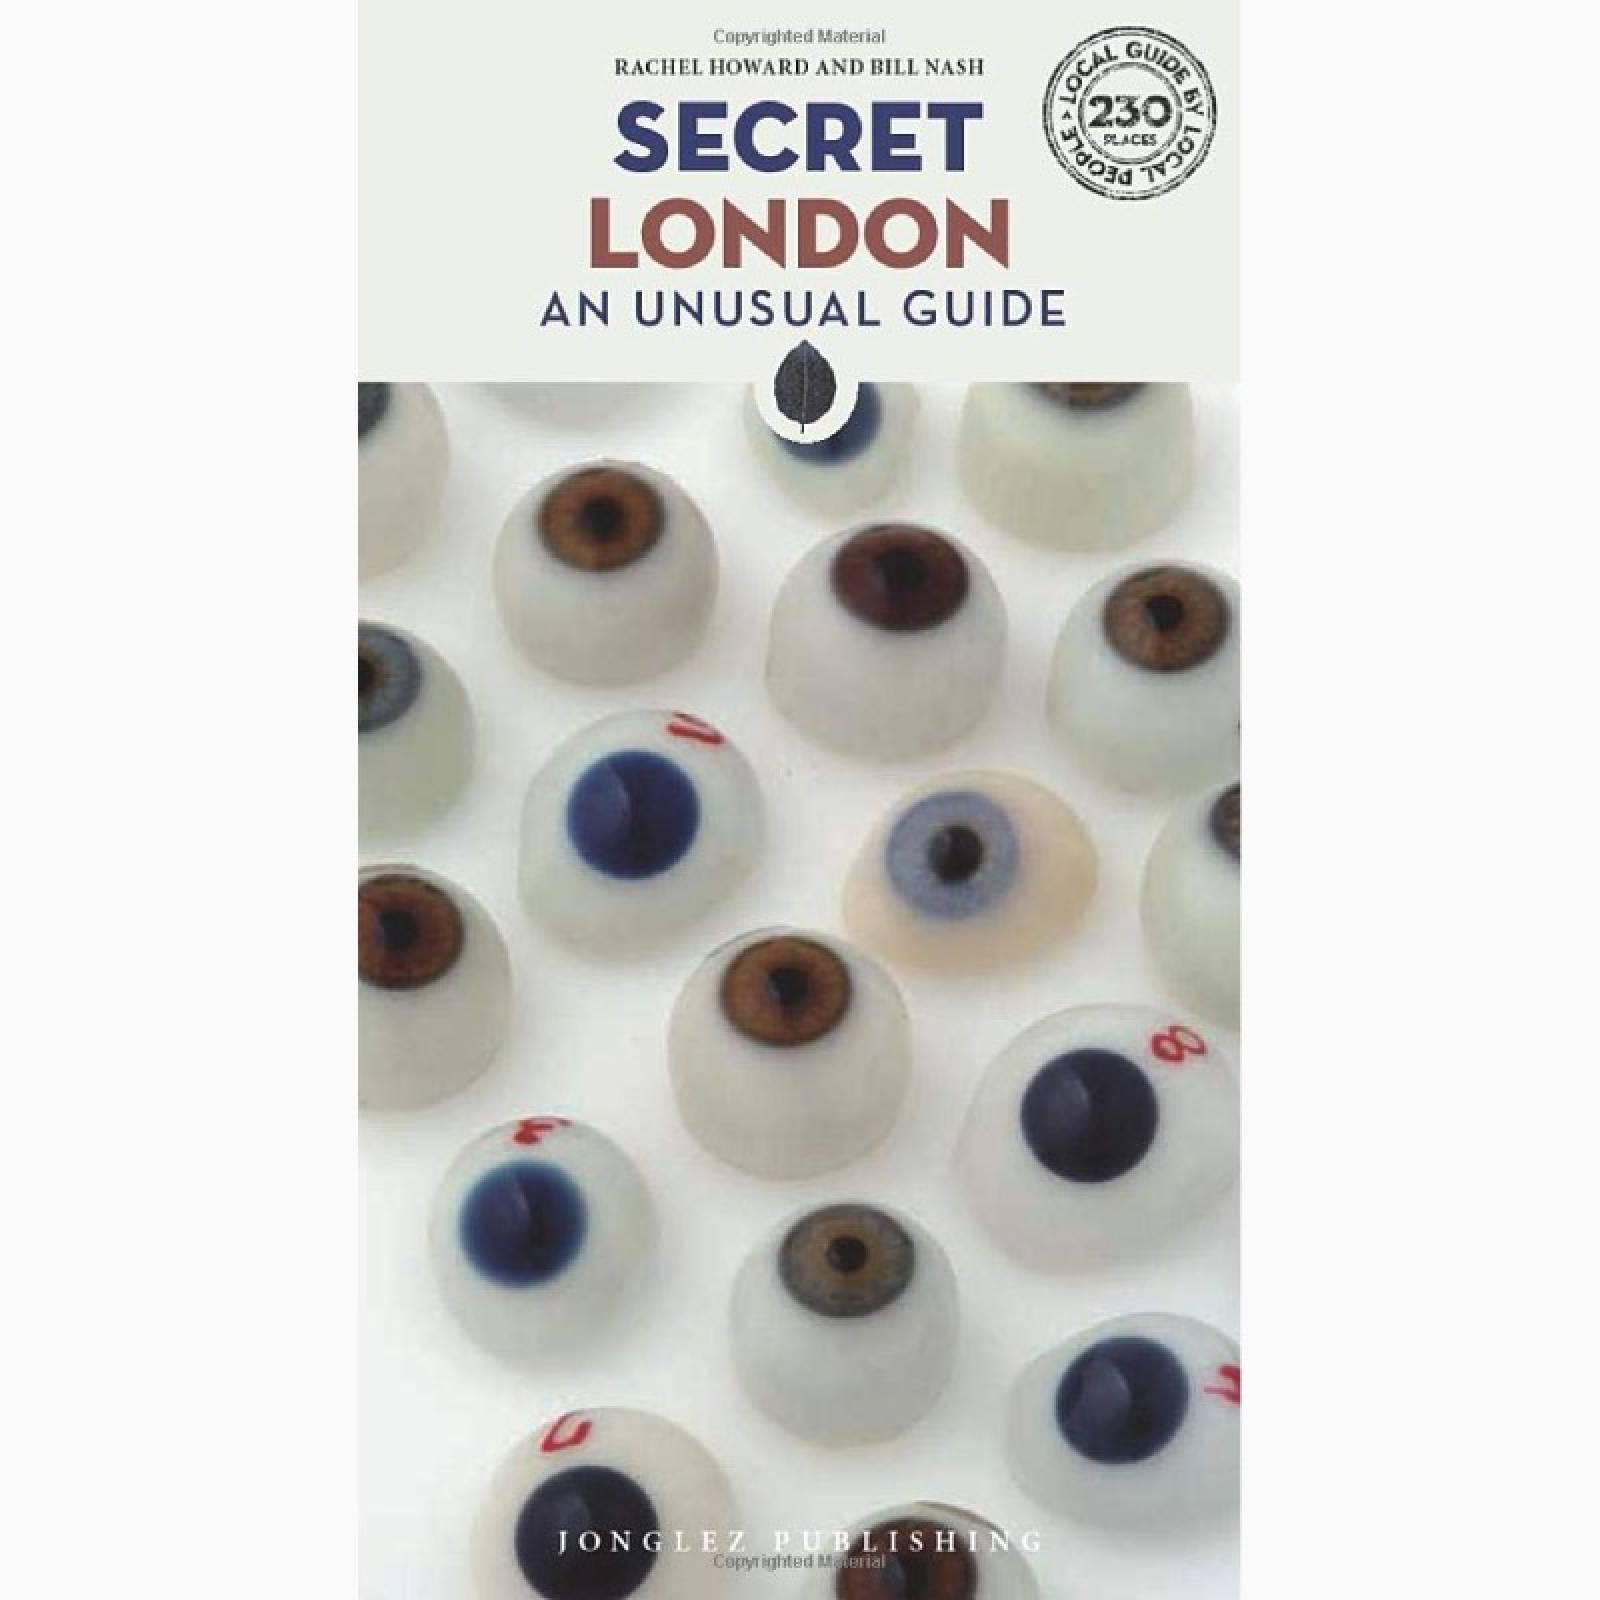 Secret London An Unusual Guide - Paperback Book